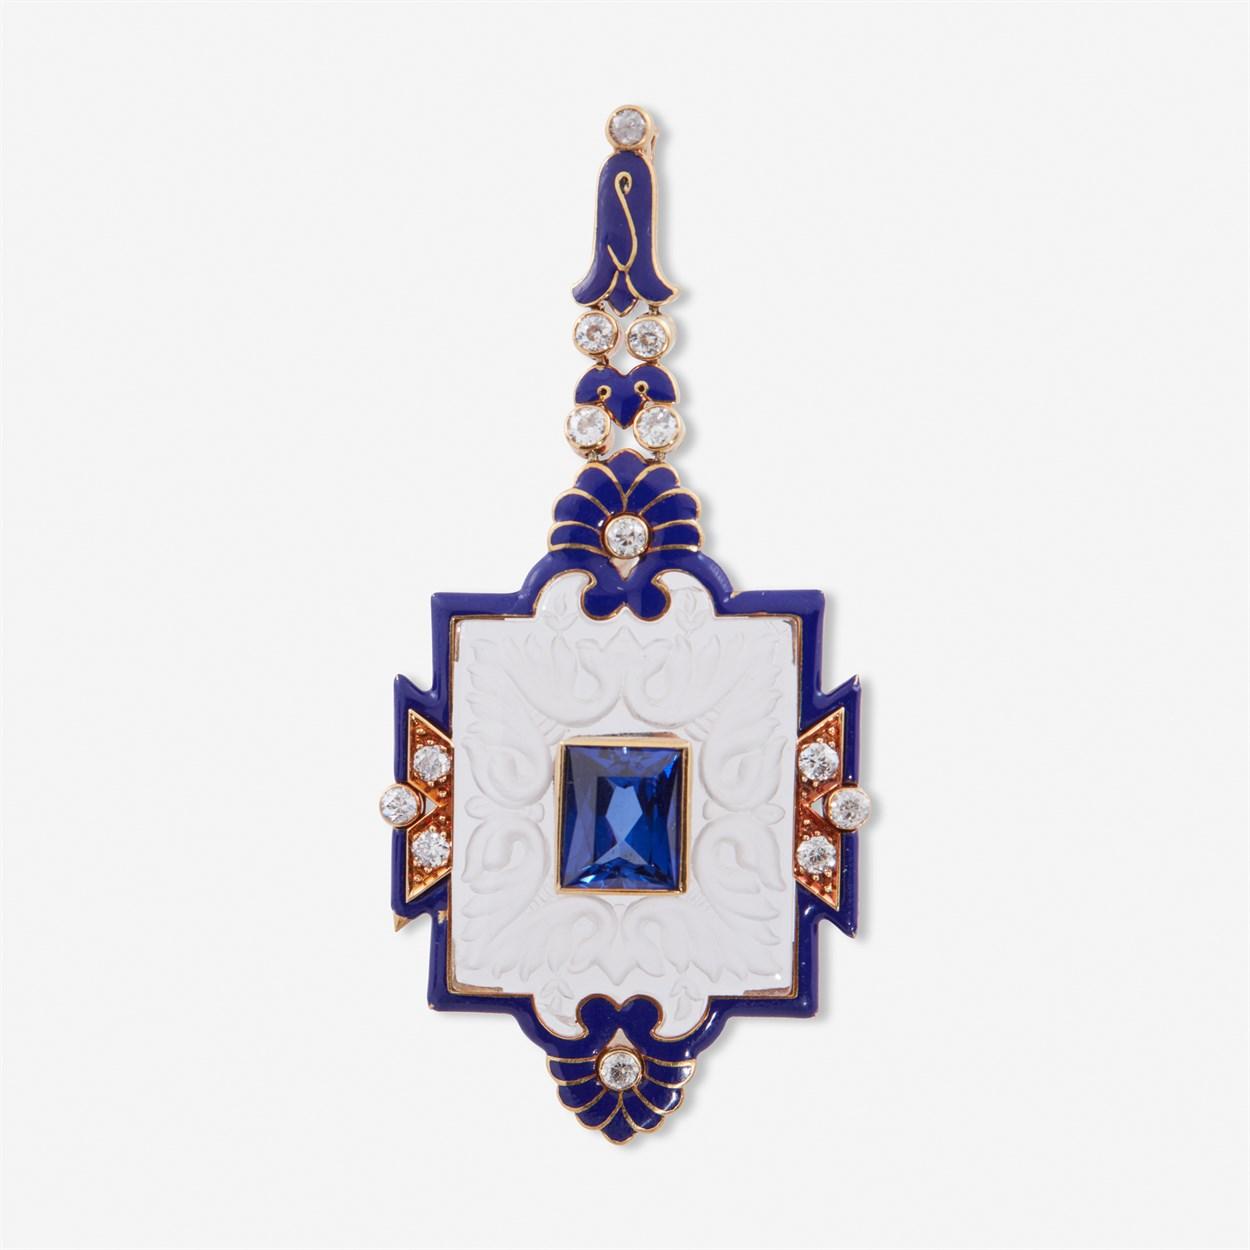 Lot 9 - An Art Deco rock crystal, enamel, diamond, and synthetic sapphire pendant, Cartier